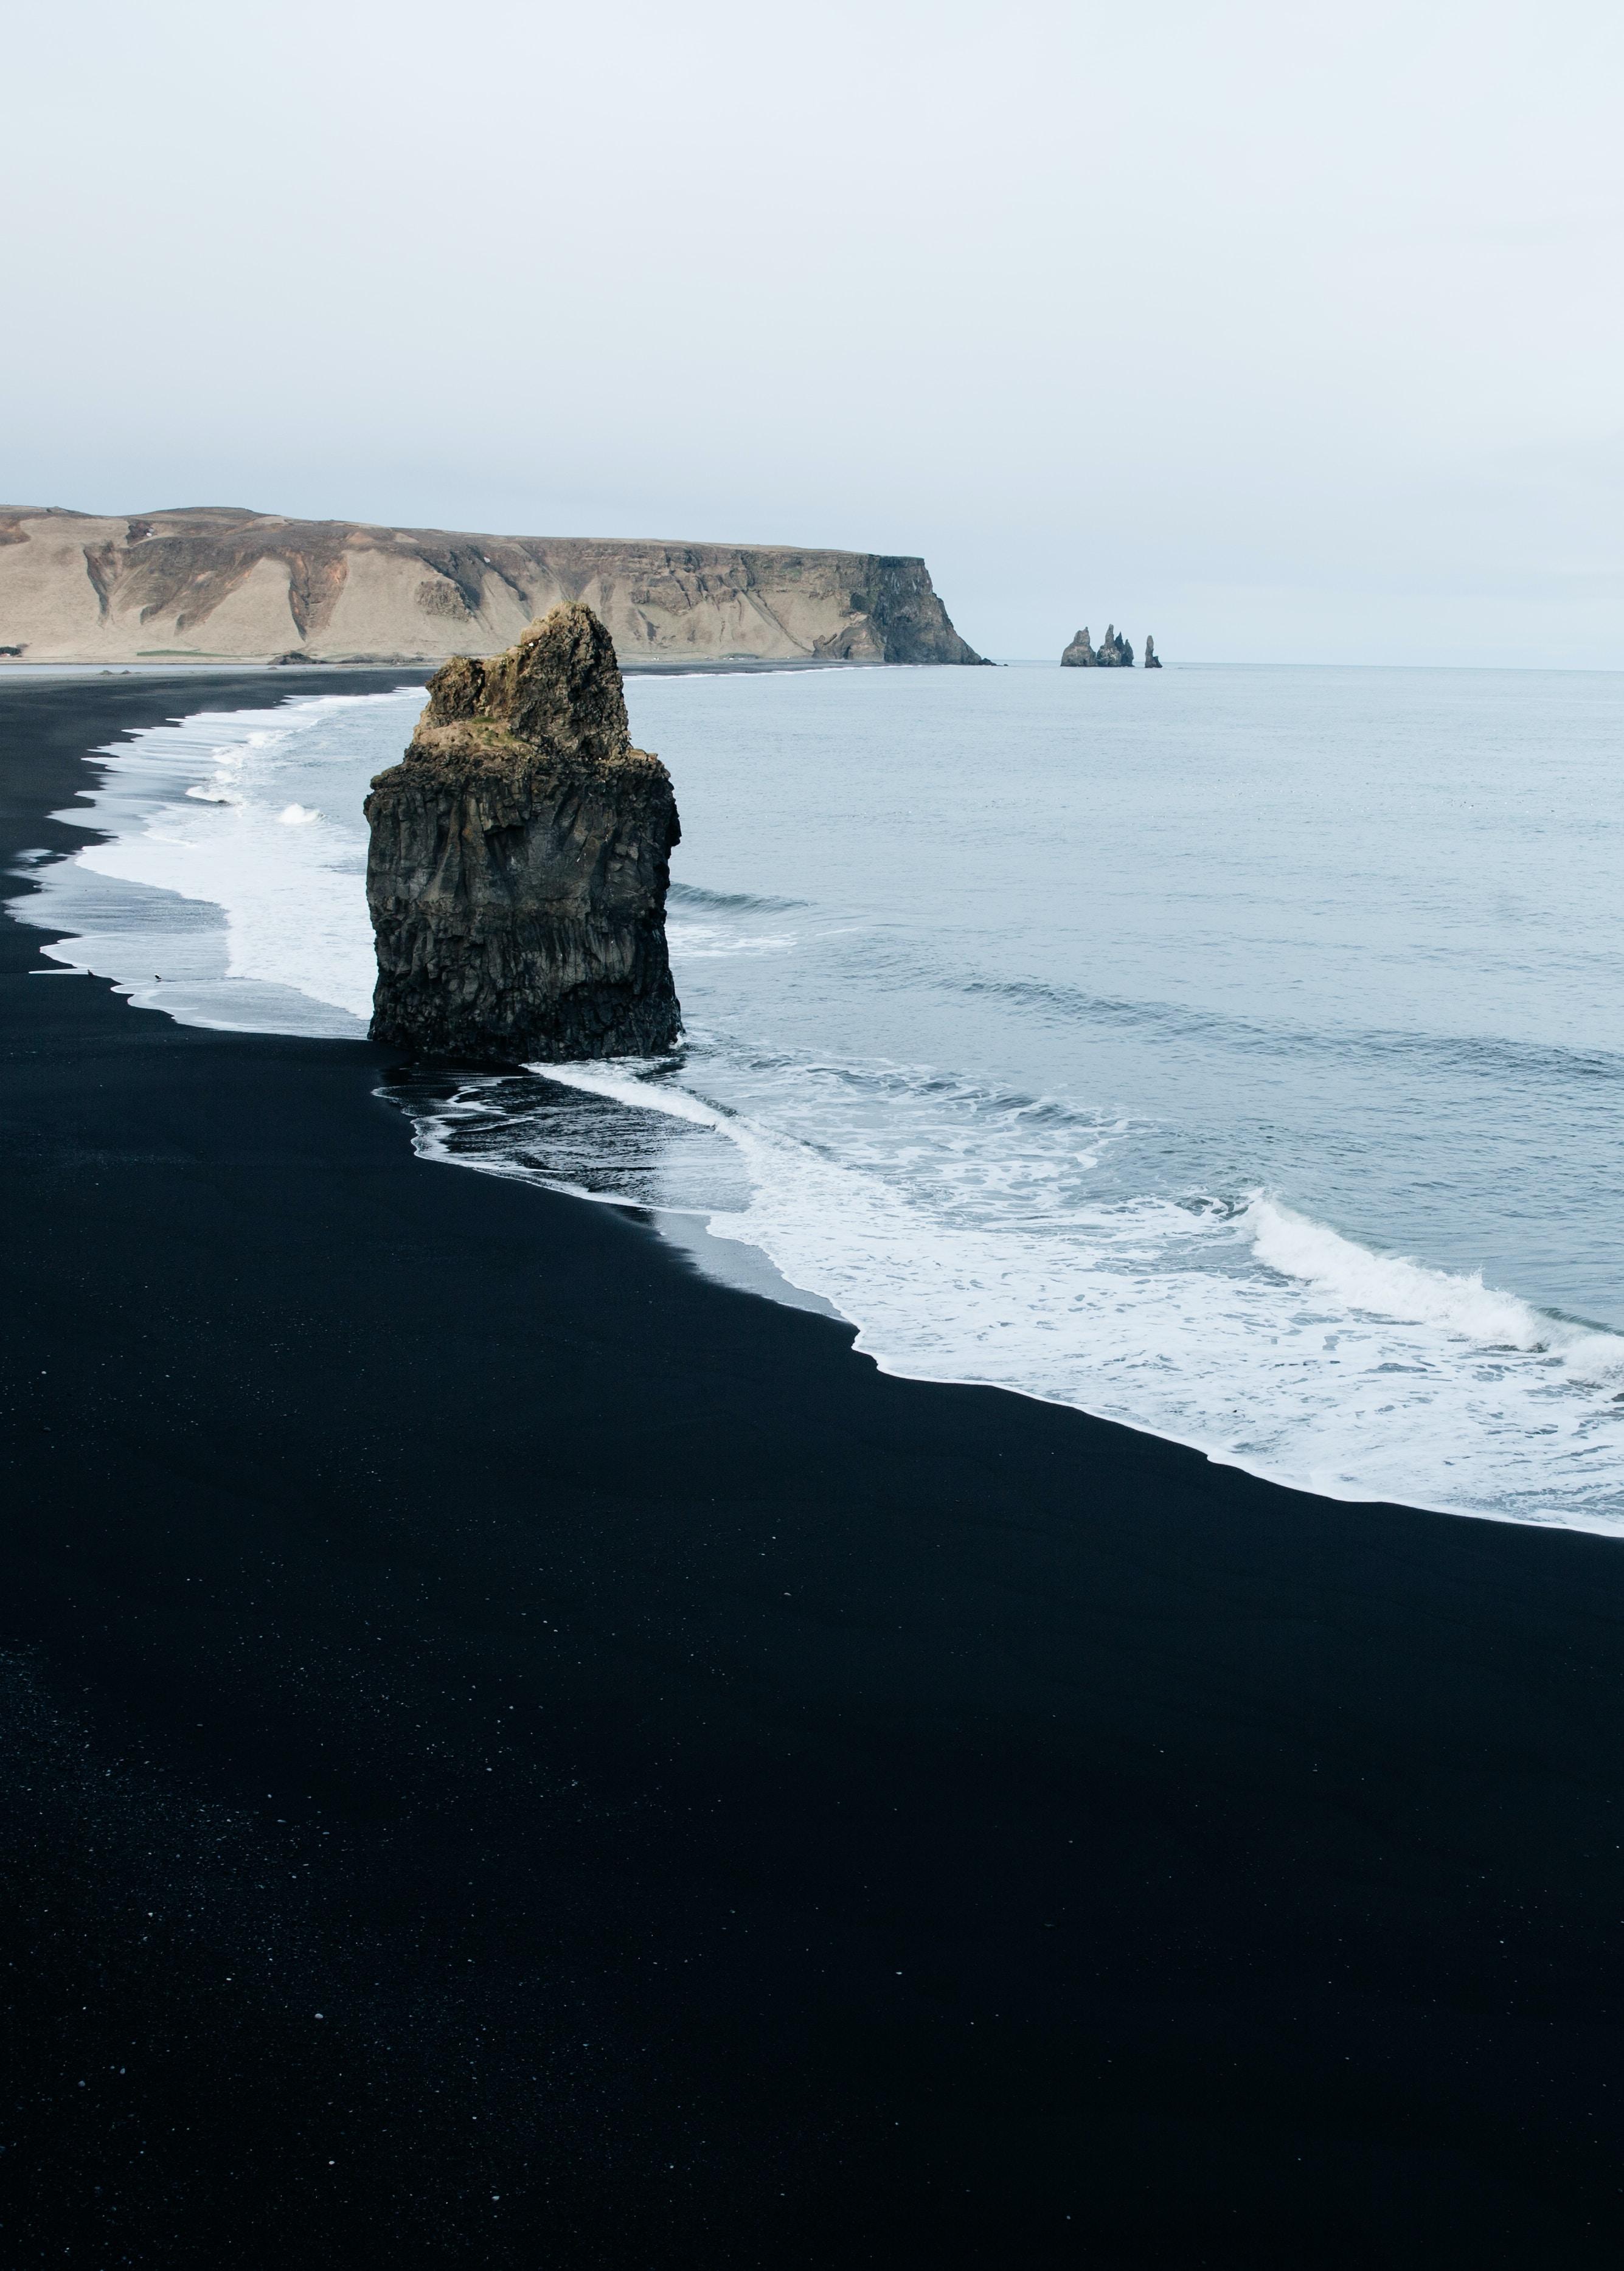 brown monolith rock on seashore